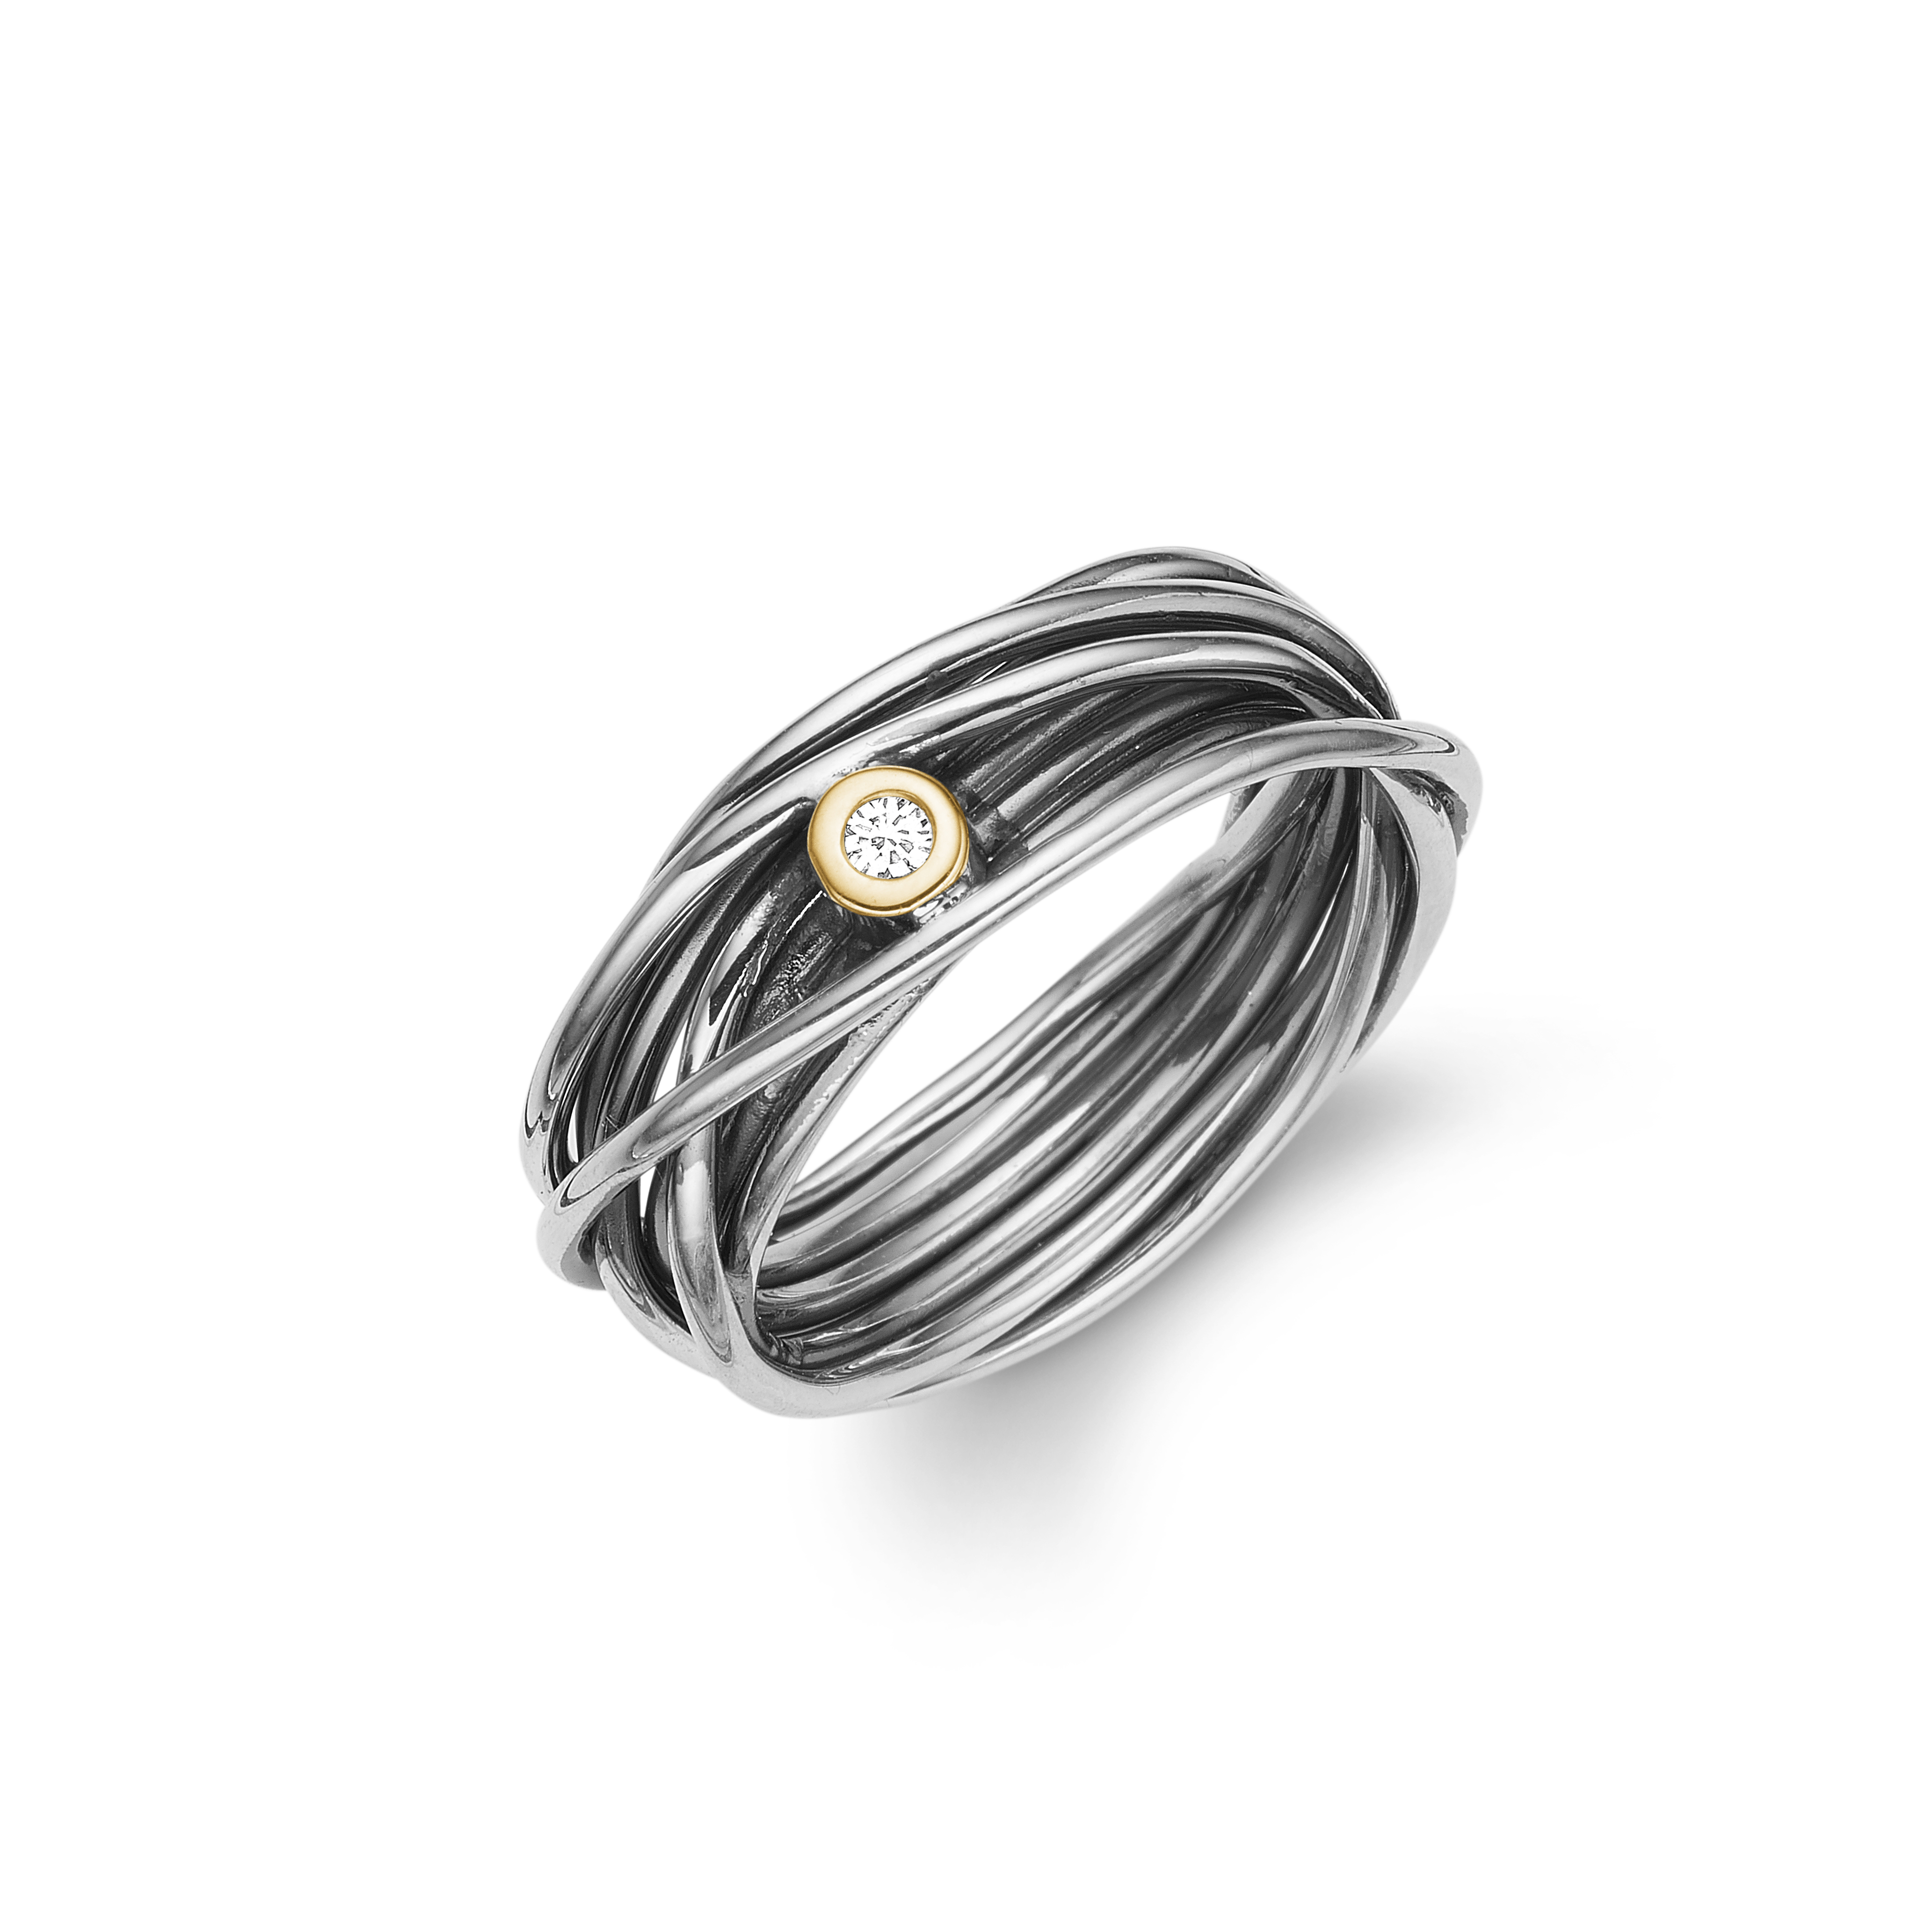 Image of   Aagaard Sølv ring - 11641528-34 Størrelse 52